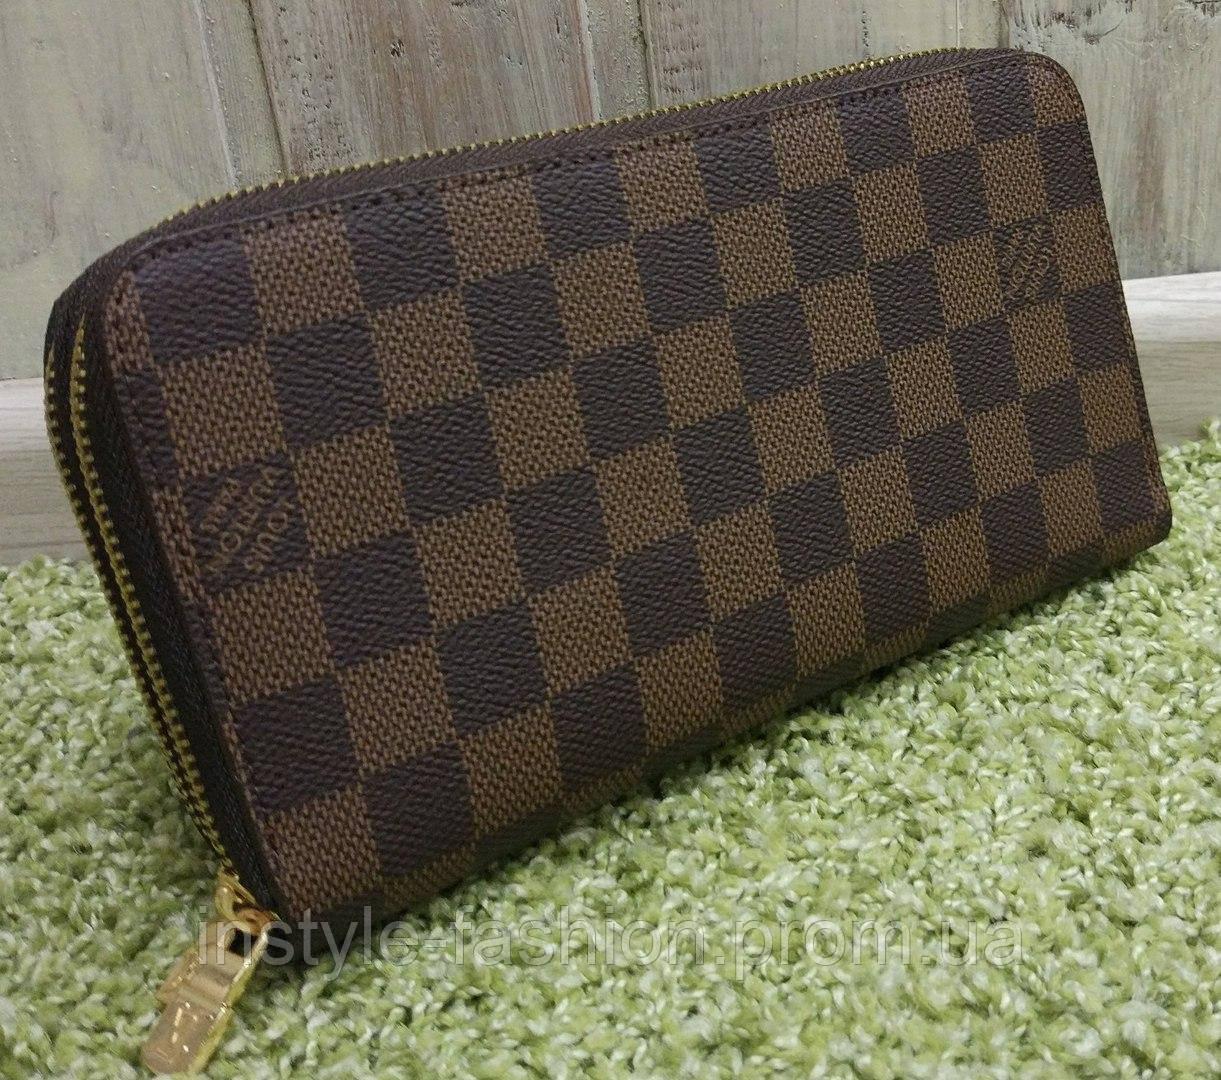 ab78ae154643 Кошелек женский брендовый Louis Vuitton Луи Виттон на две змейки коричневый